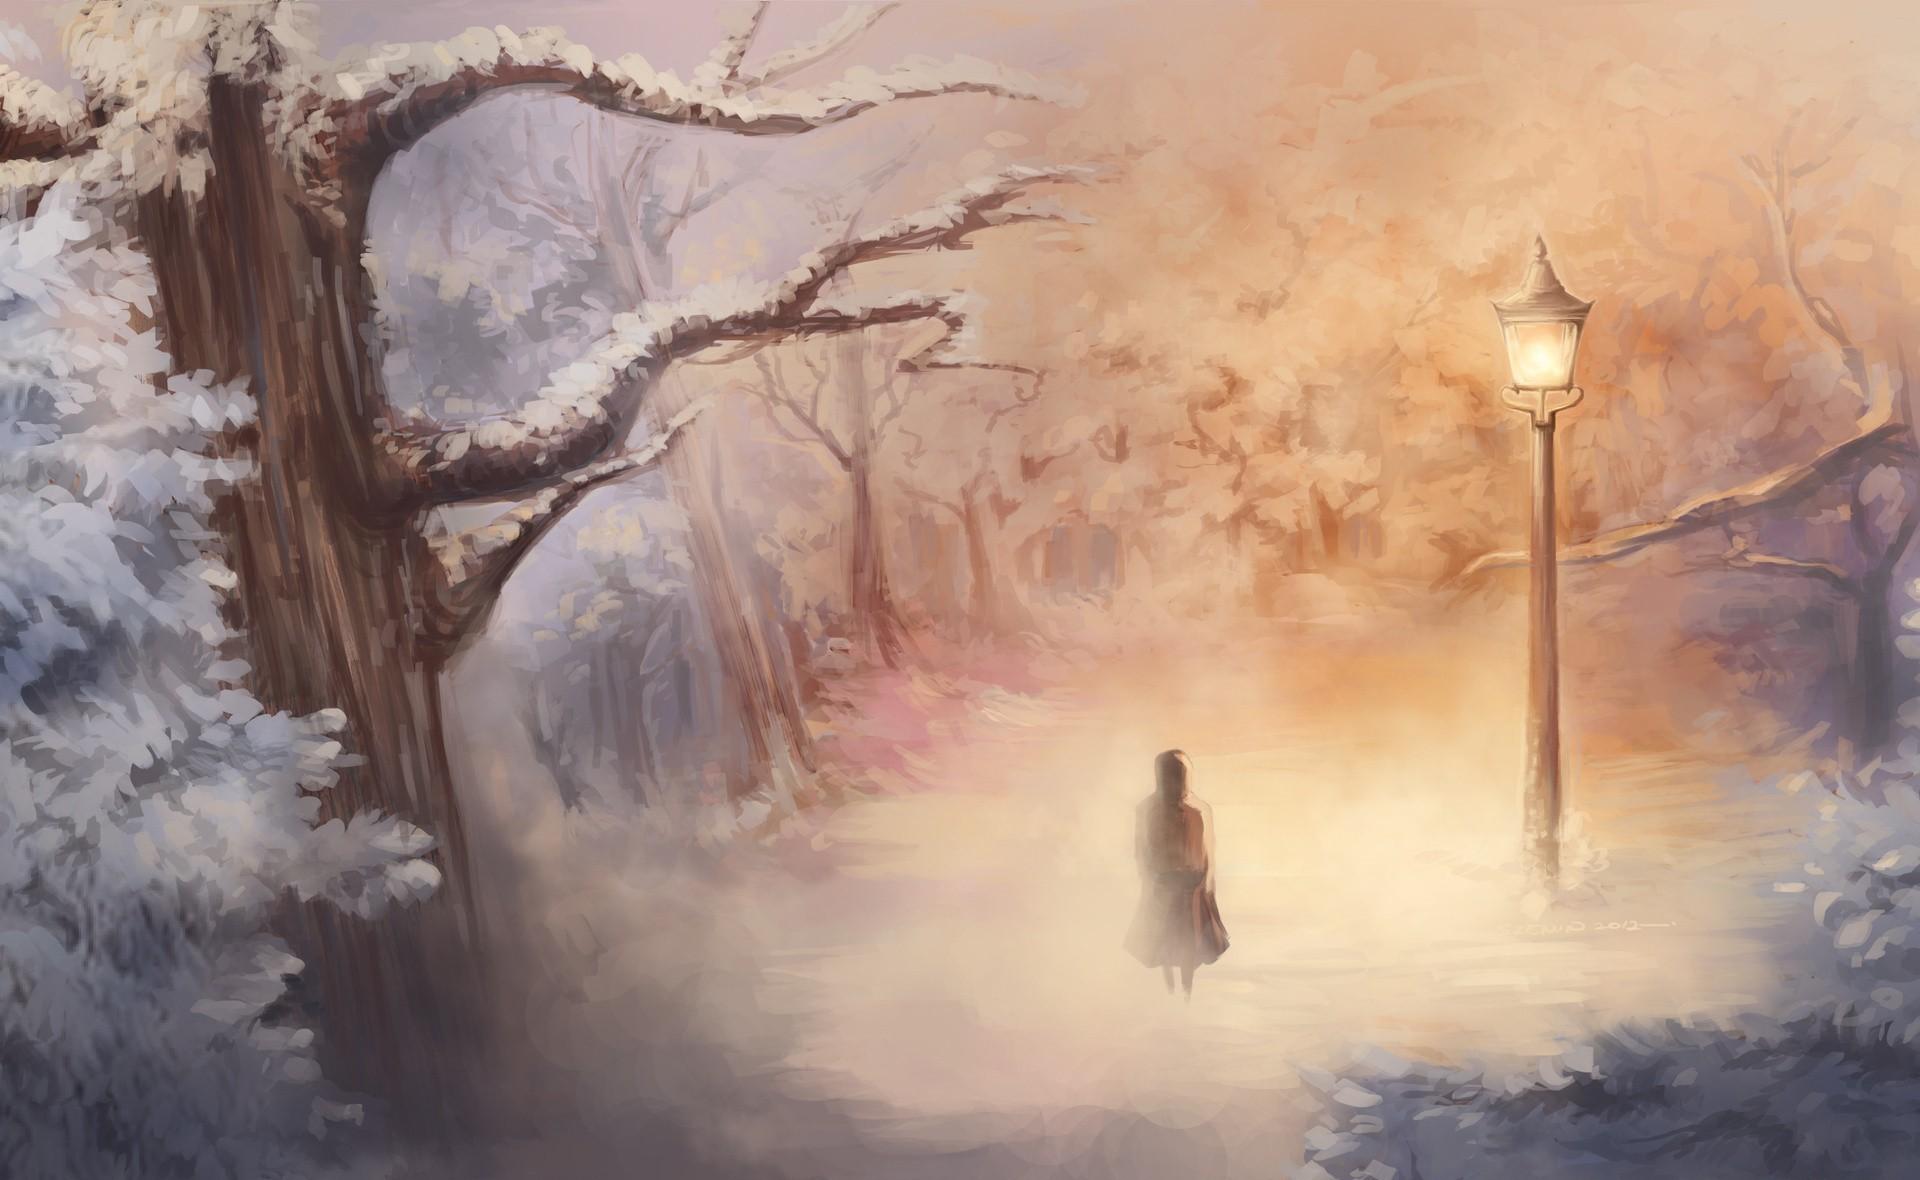 картинки фэнтези туман форму приняла